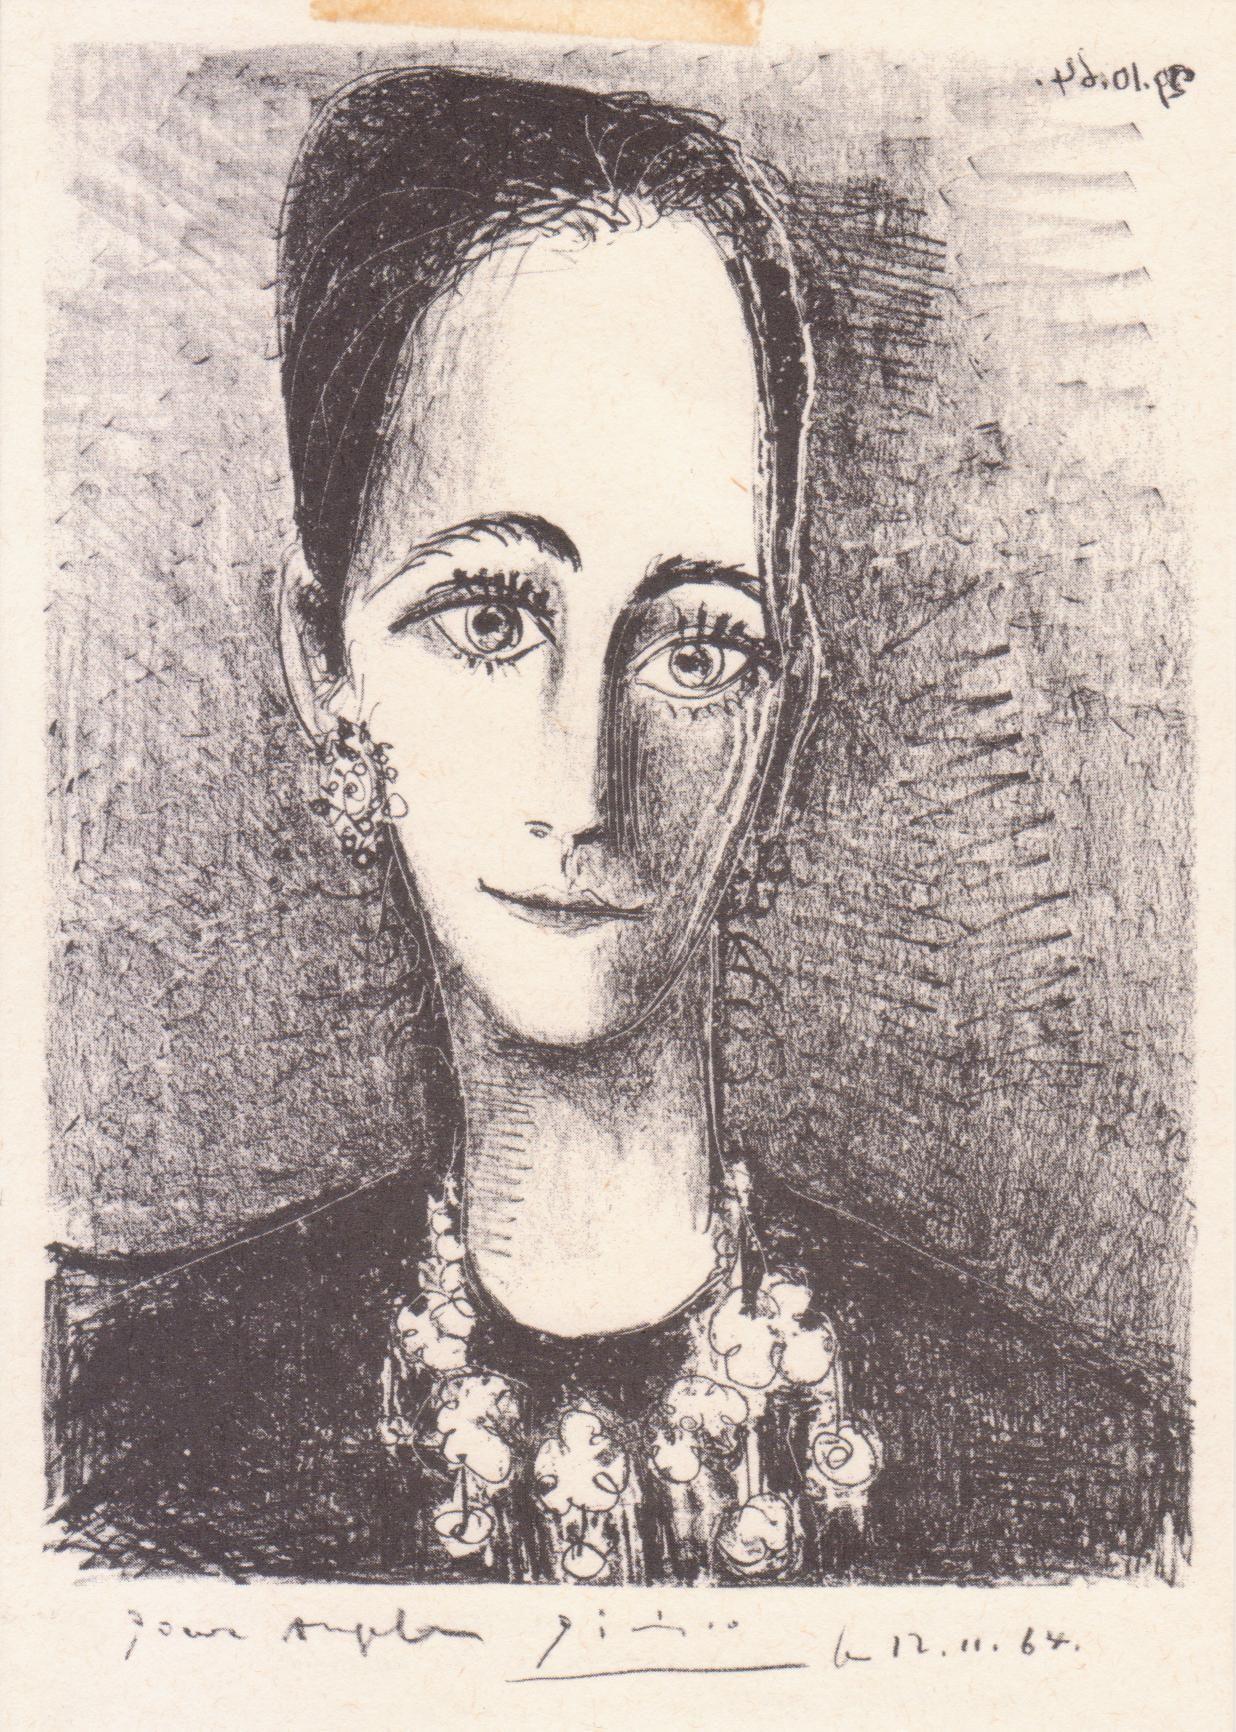 Pablo Picasso - Retrato de la señora Rosengart